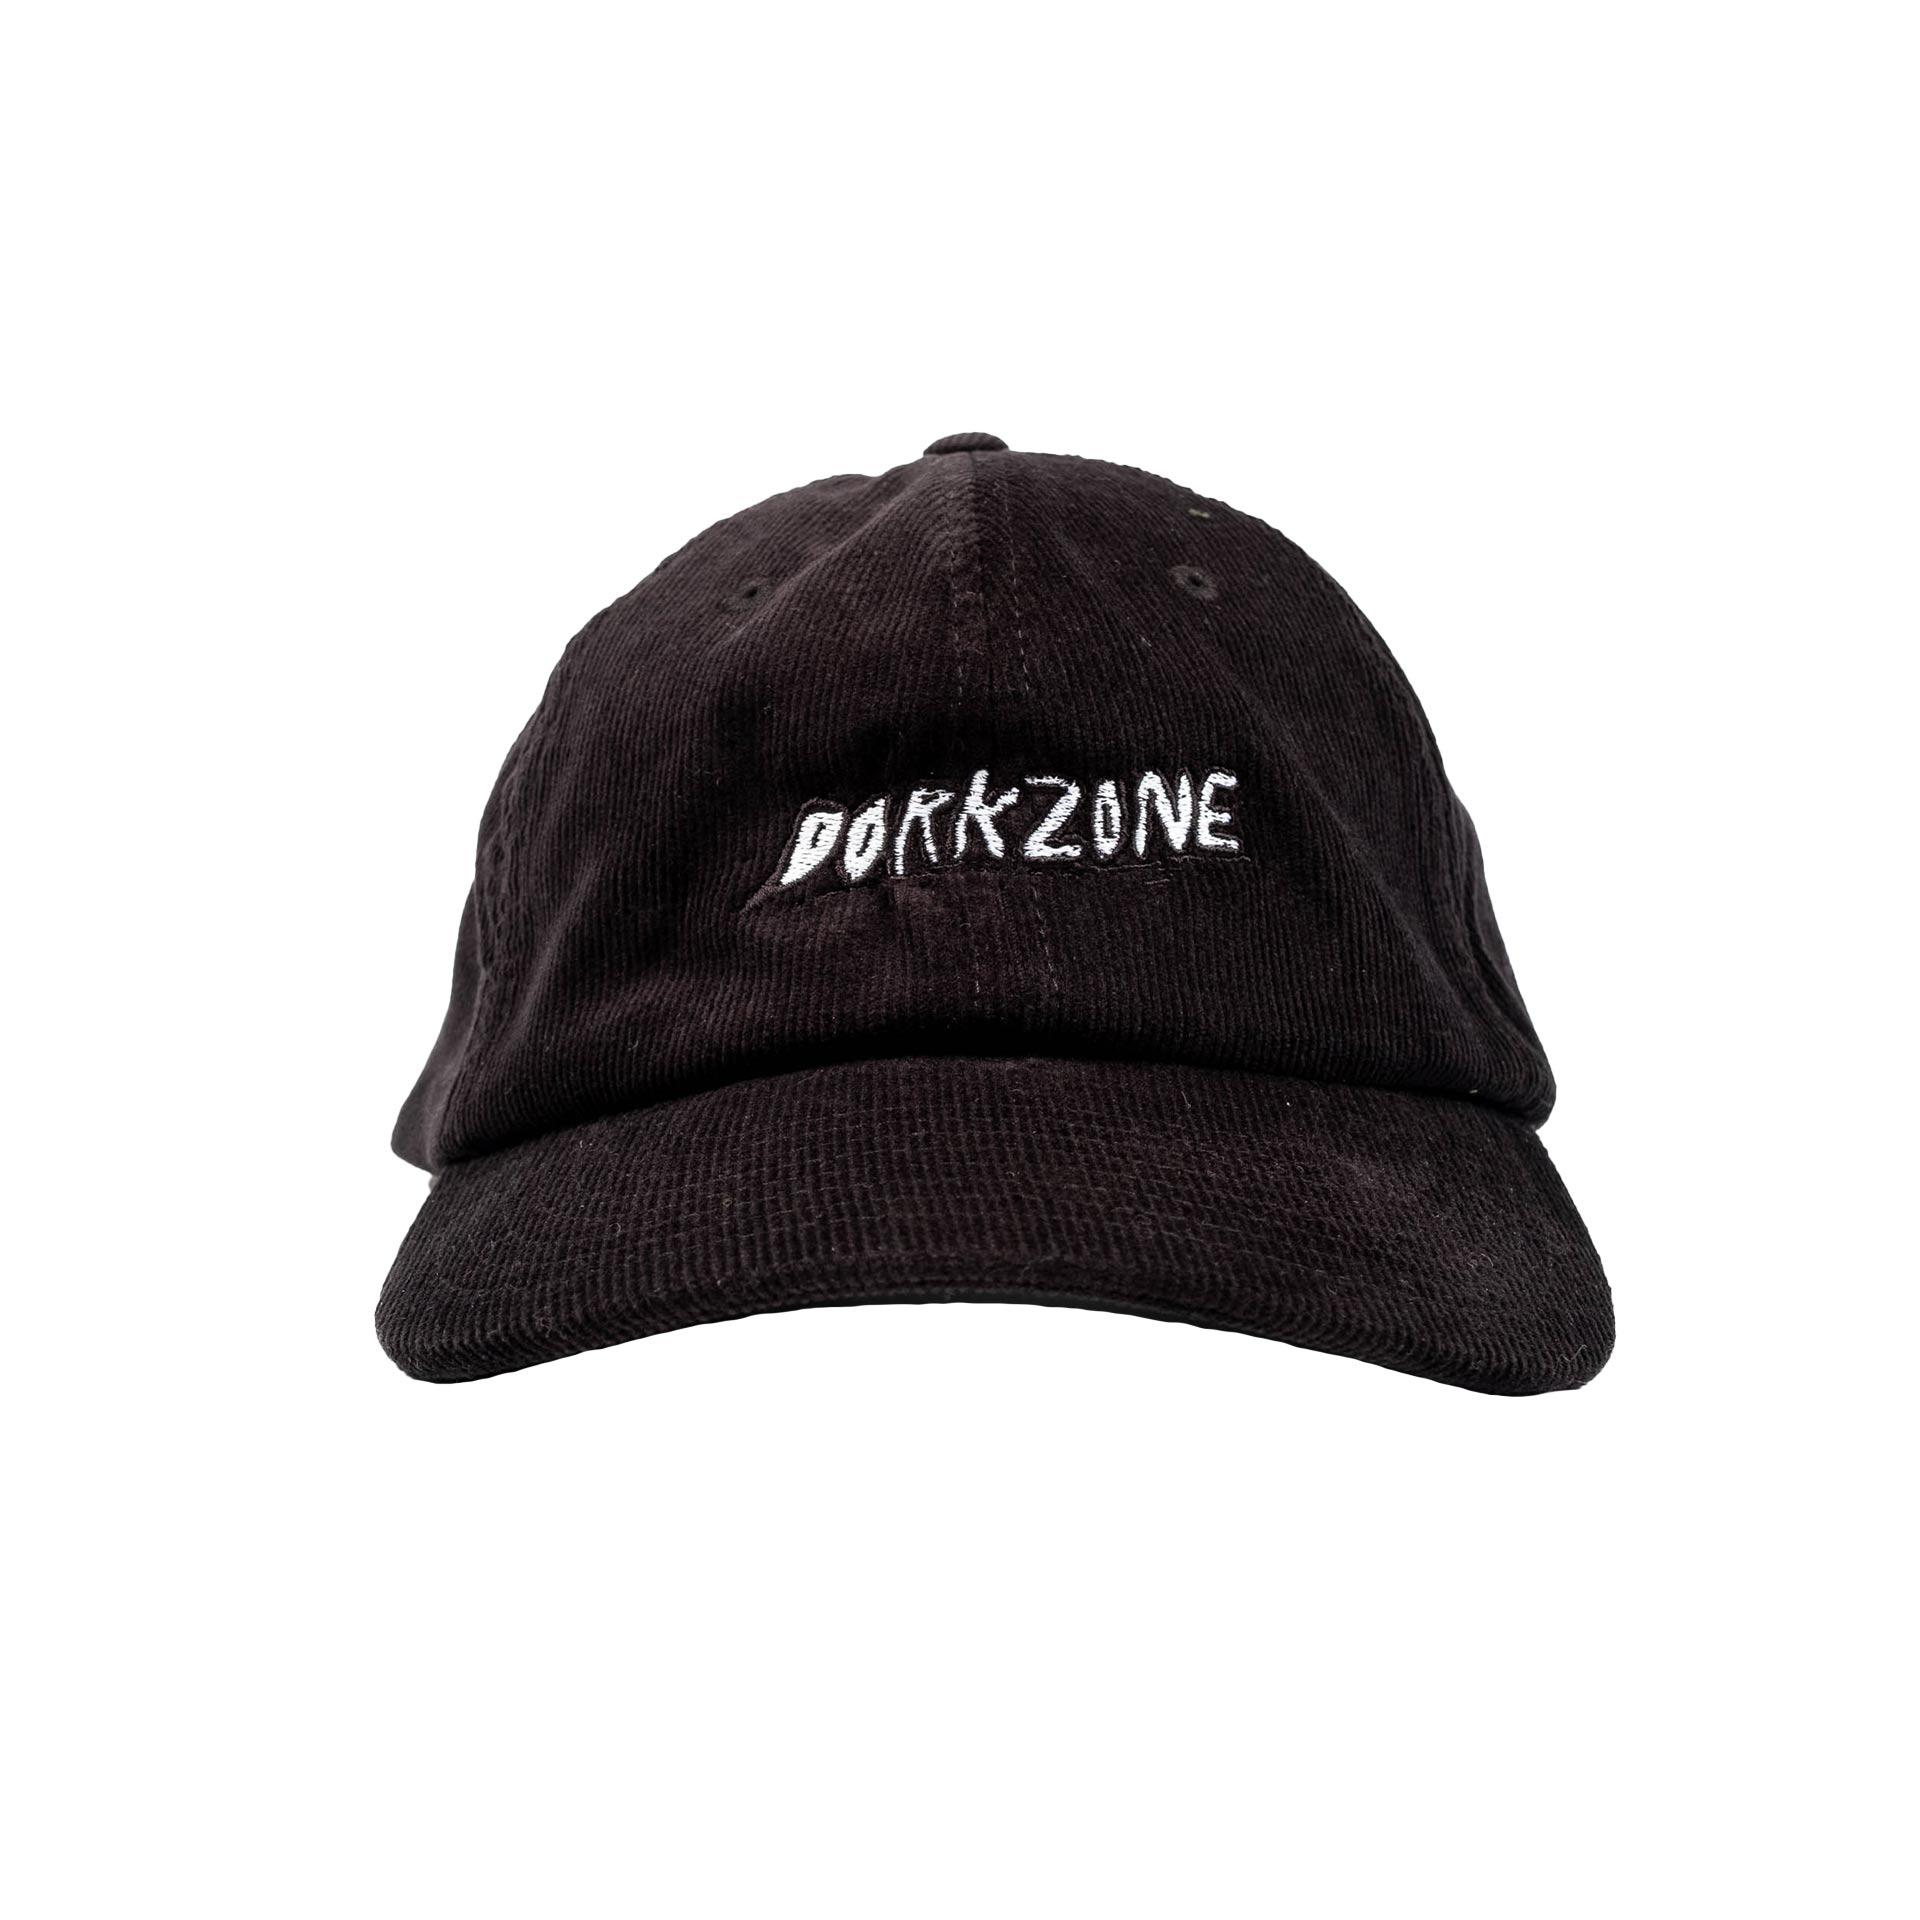 Dorkzone Embroided Ink Text Corduroy Cap Black